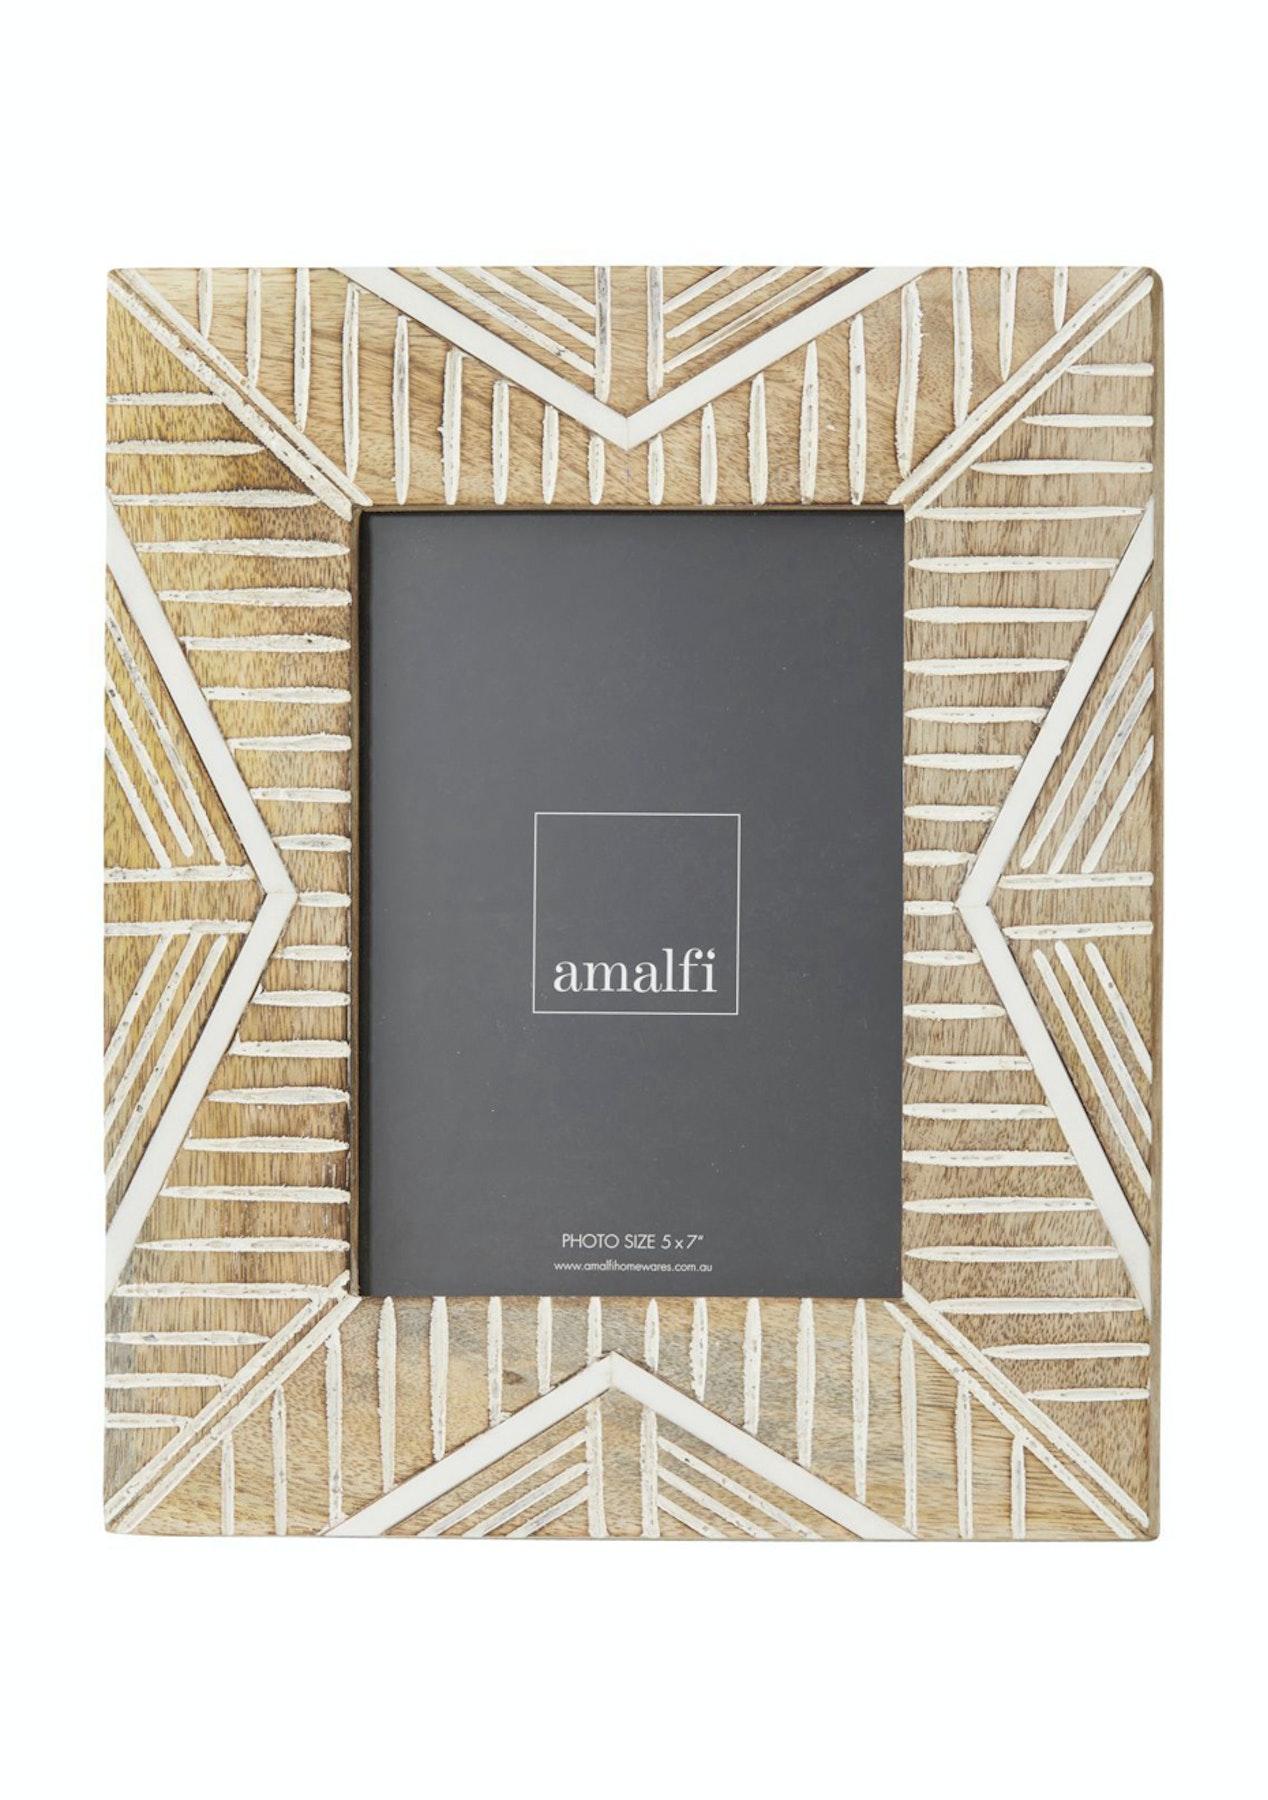 Amalfi - Bohemi 5x7